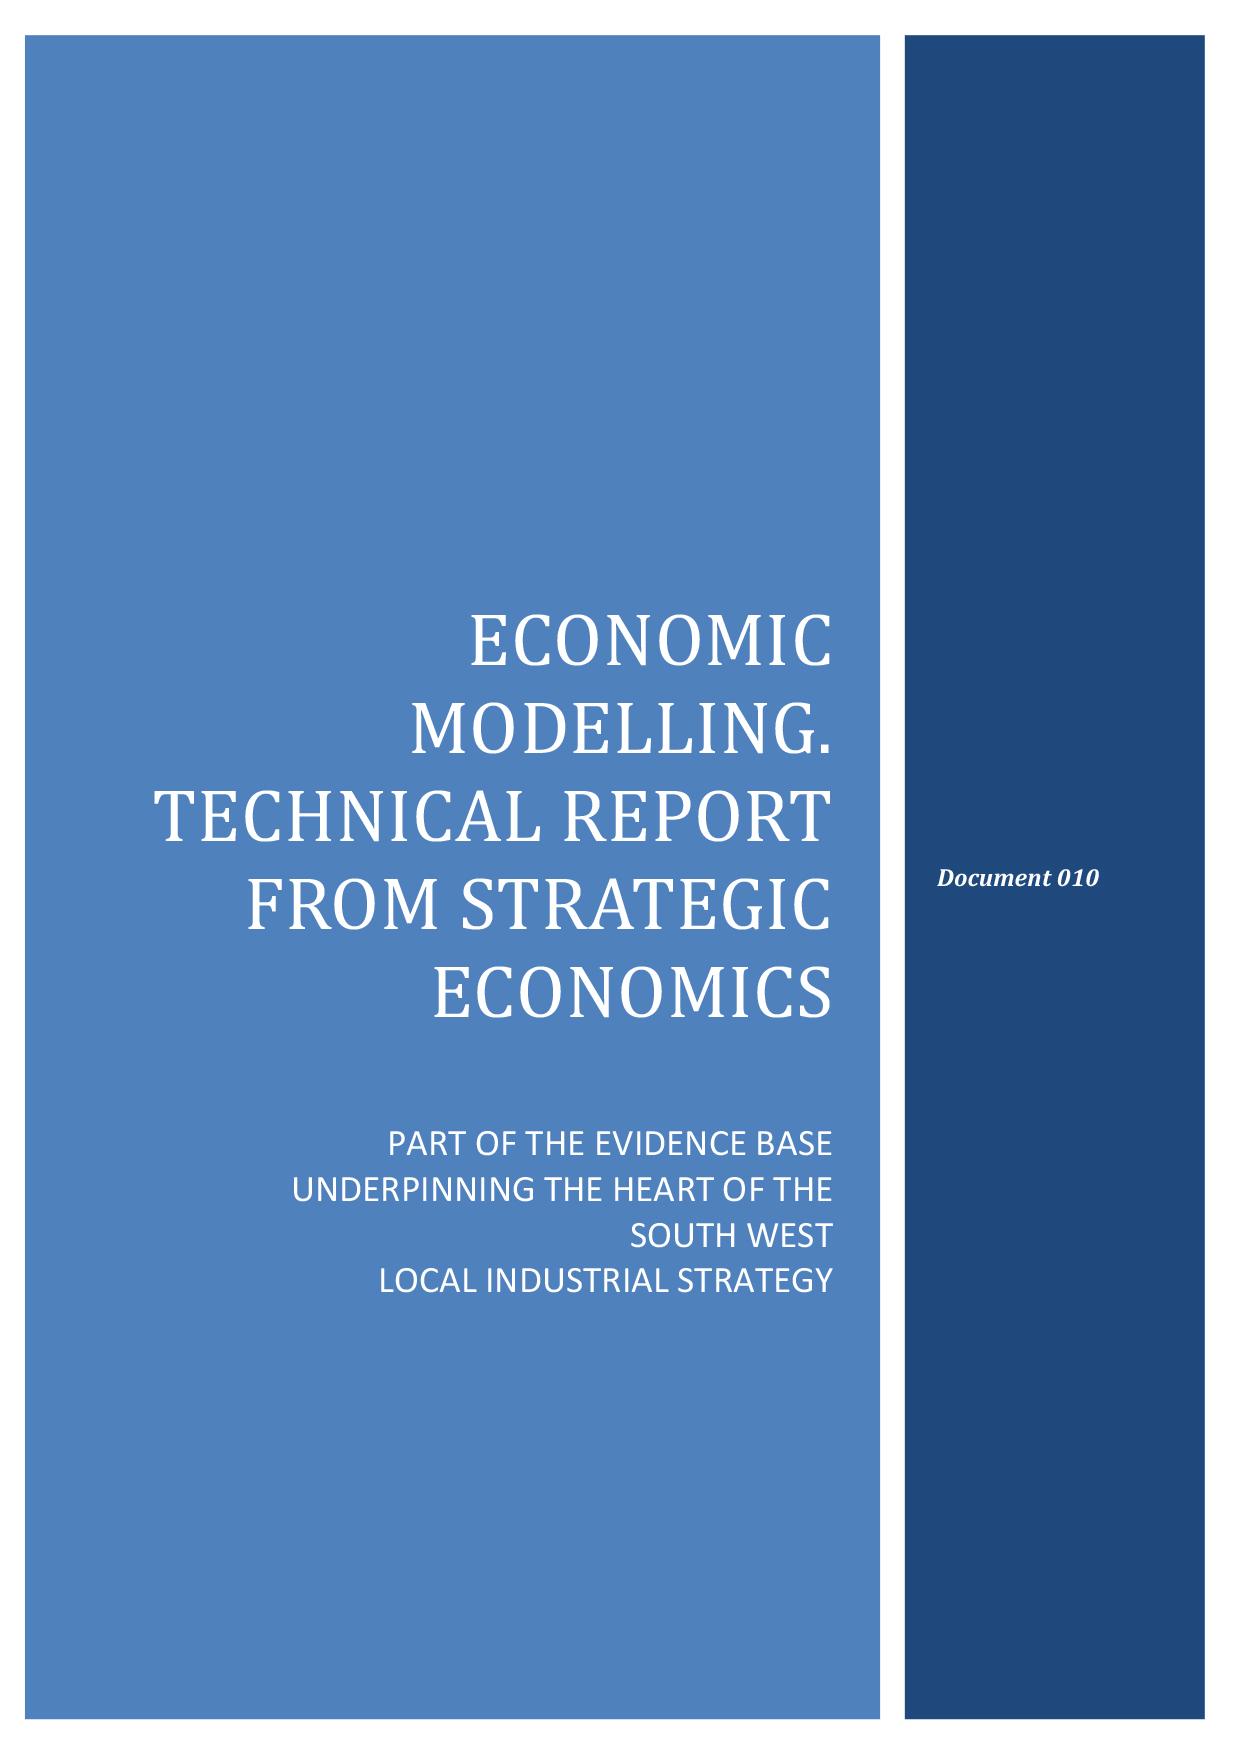 Microsoft Word - 010 Economic Modelling